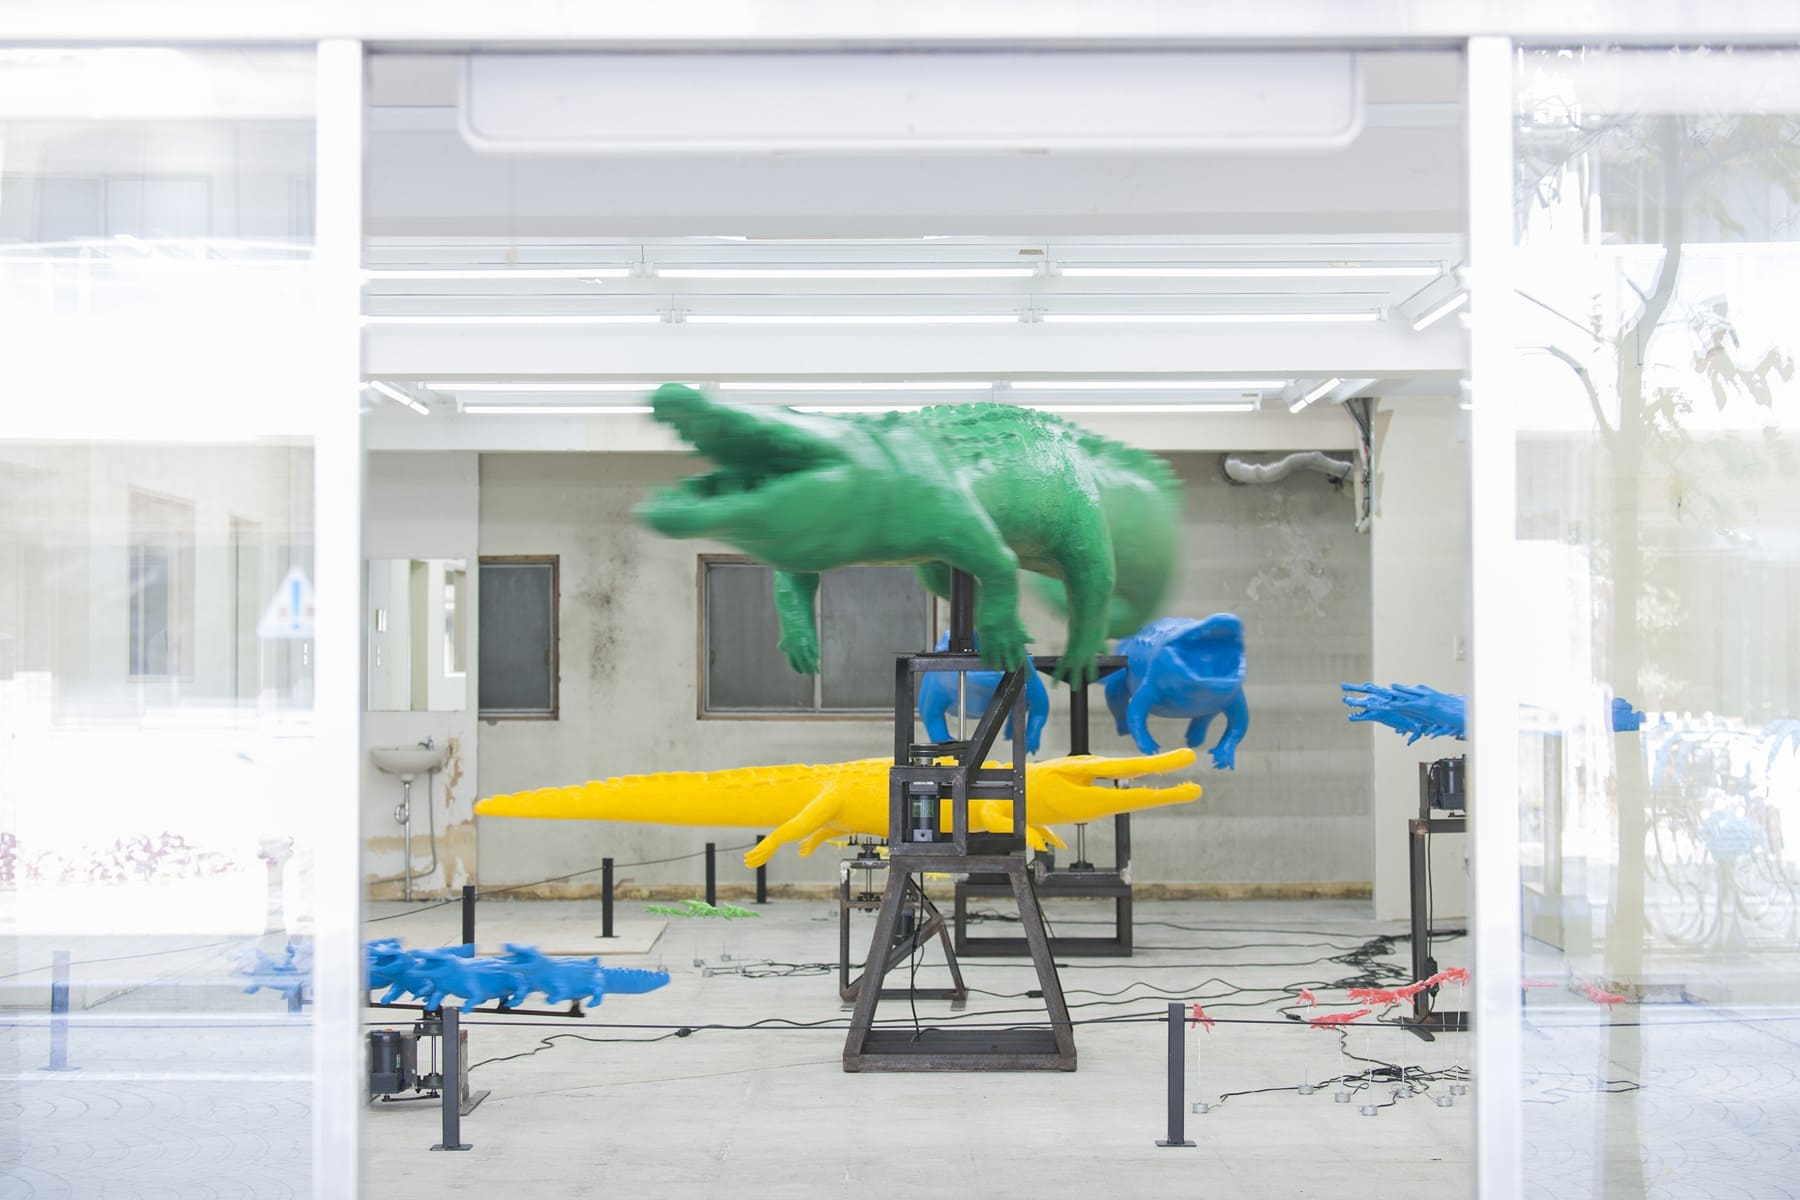 ART PROJECT TAKASAKI 2017